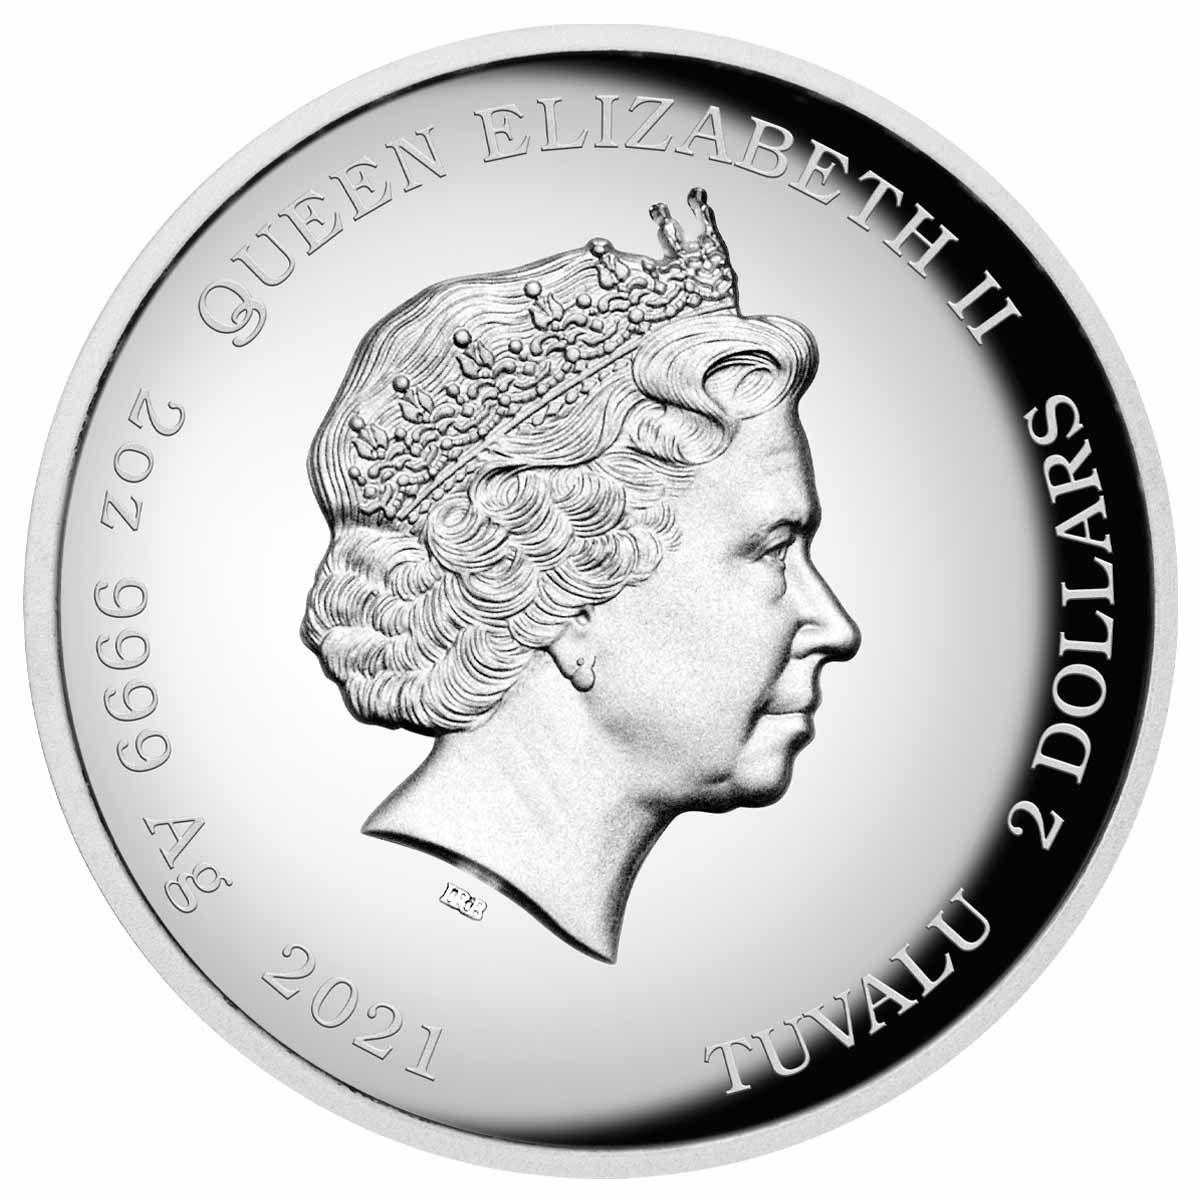 Тувалу монета 2 доллара 2021 год, аверс